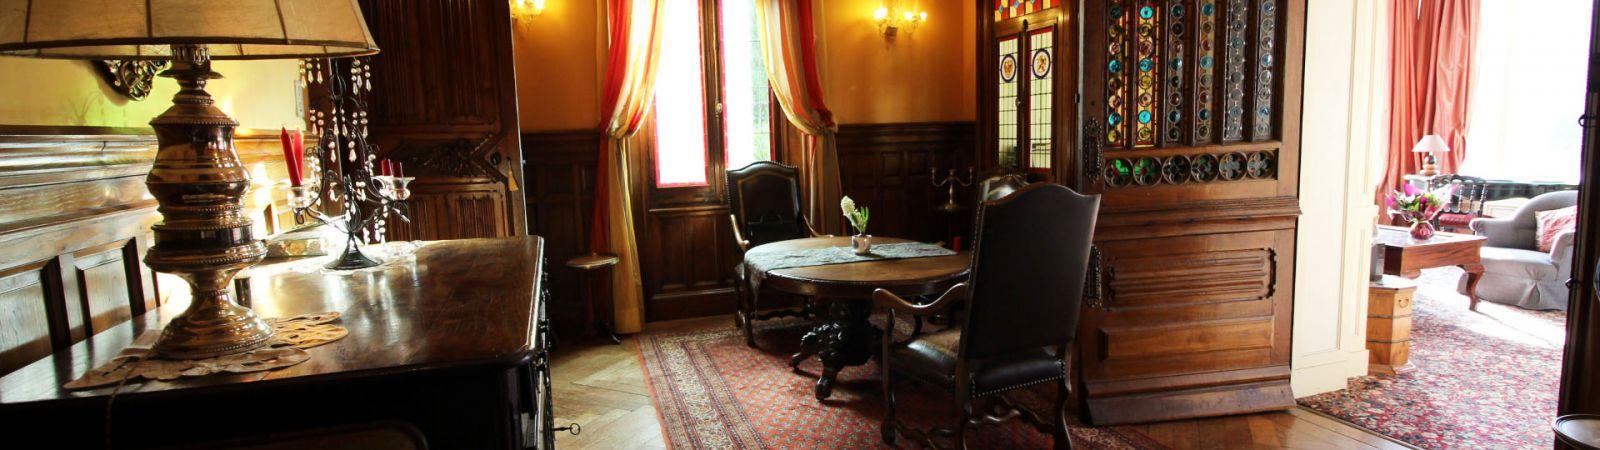 photo 3: Somptueuse demeure du XIXème siècle